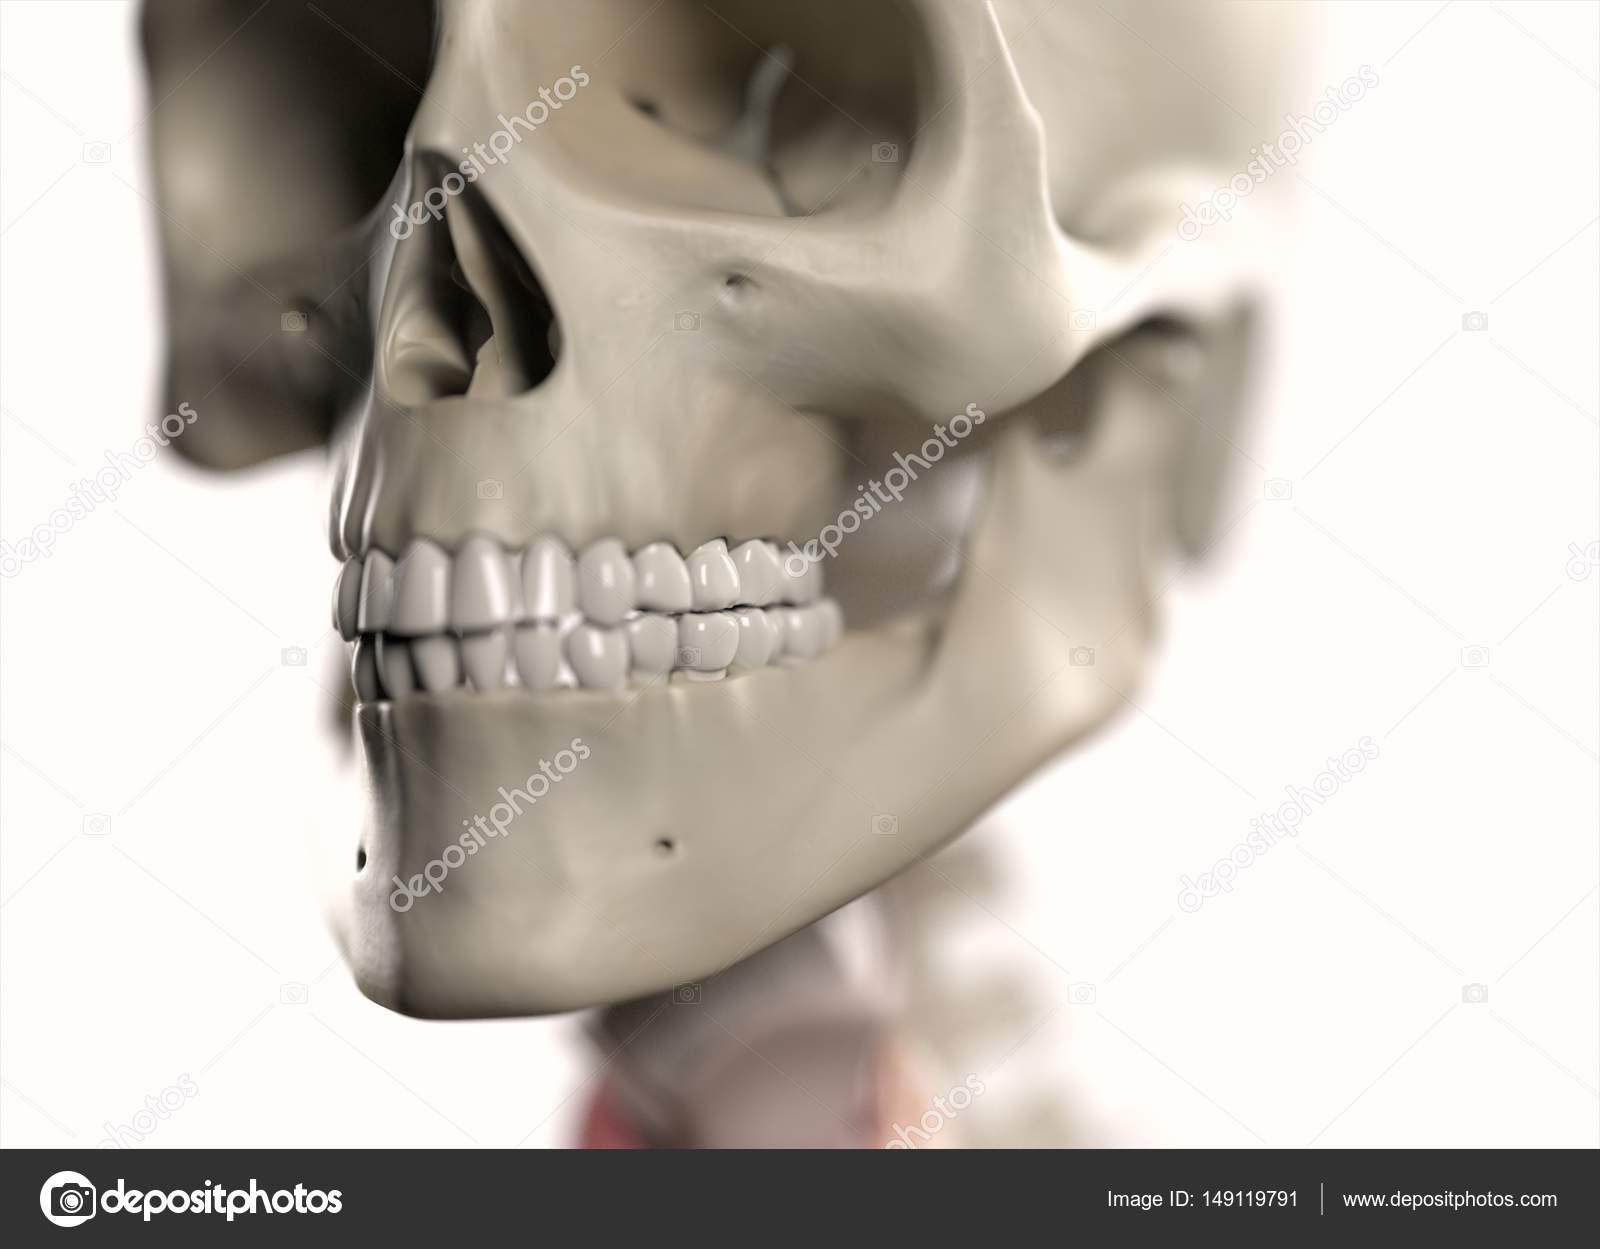 Human Skull anatomy model — Stock Photo © AnatomyInsider #149119791